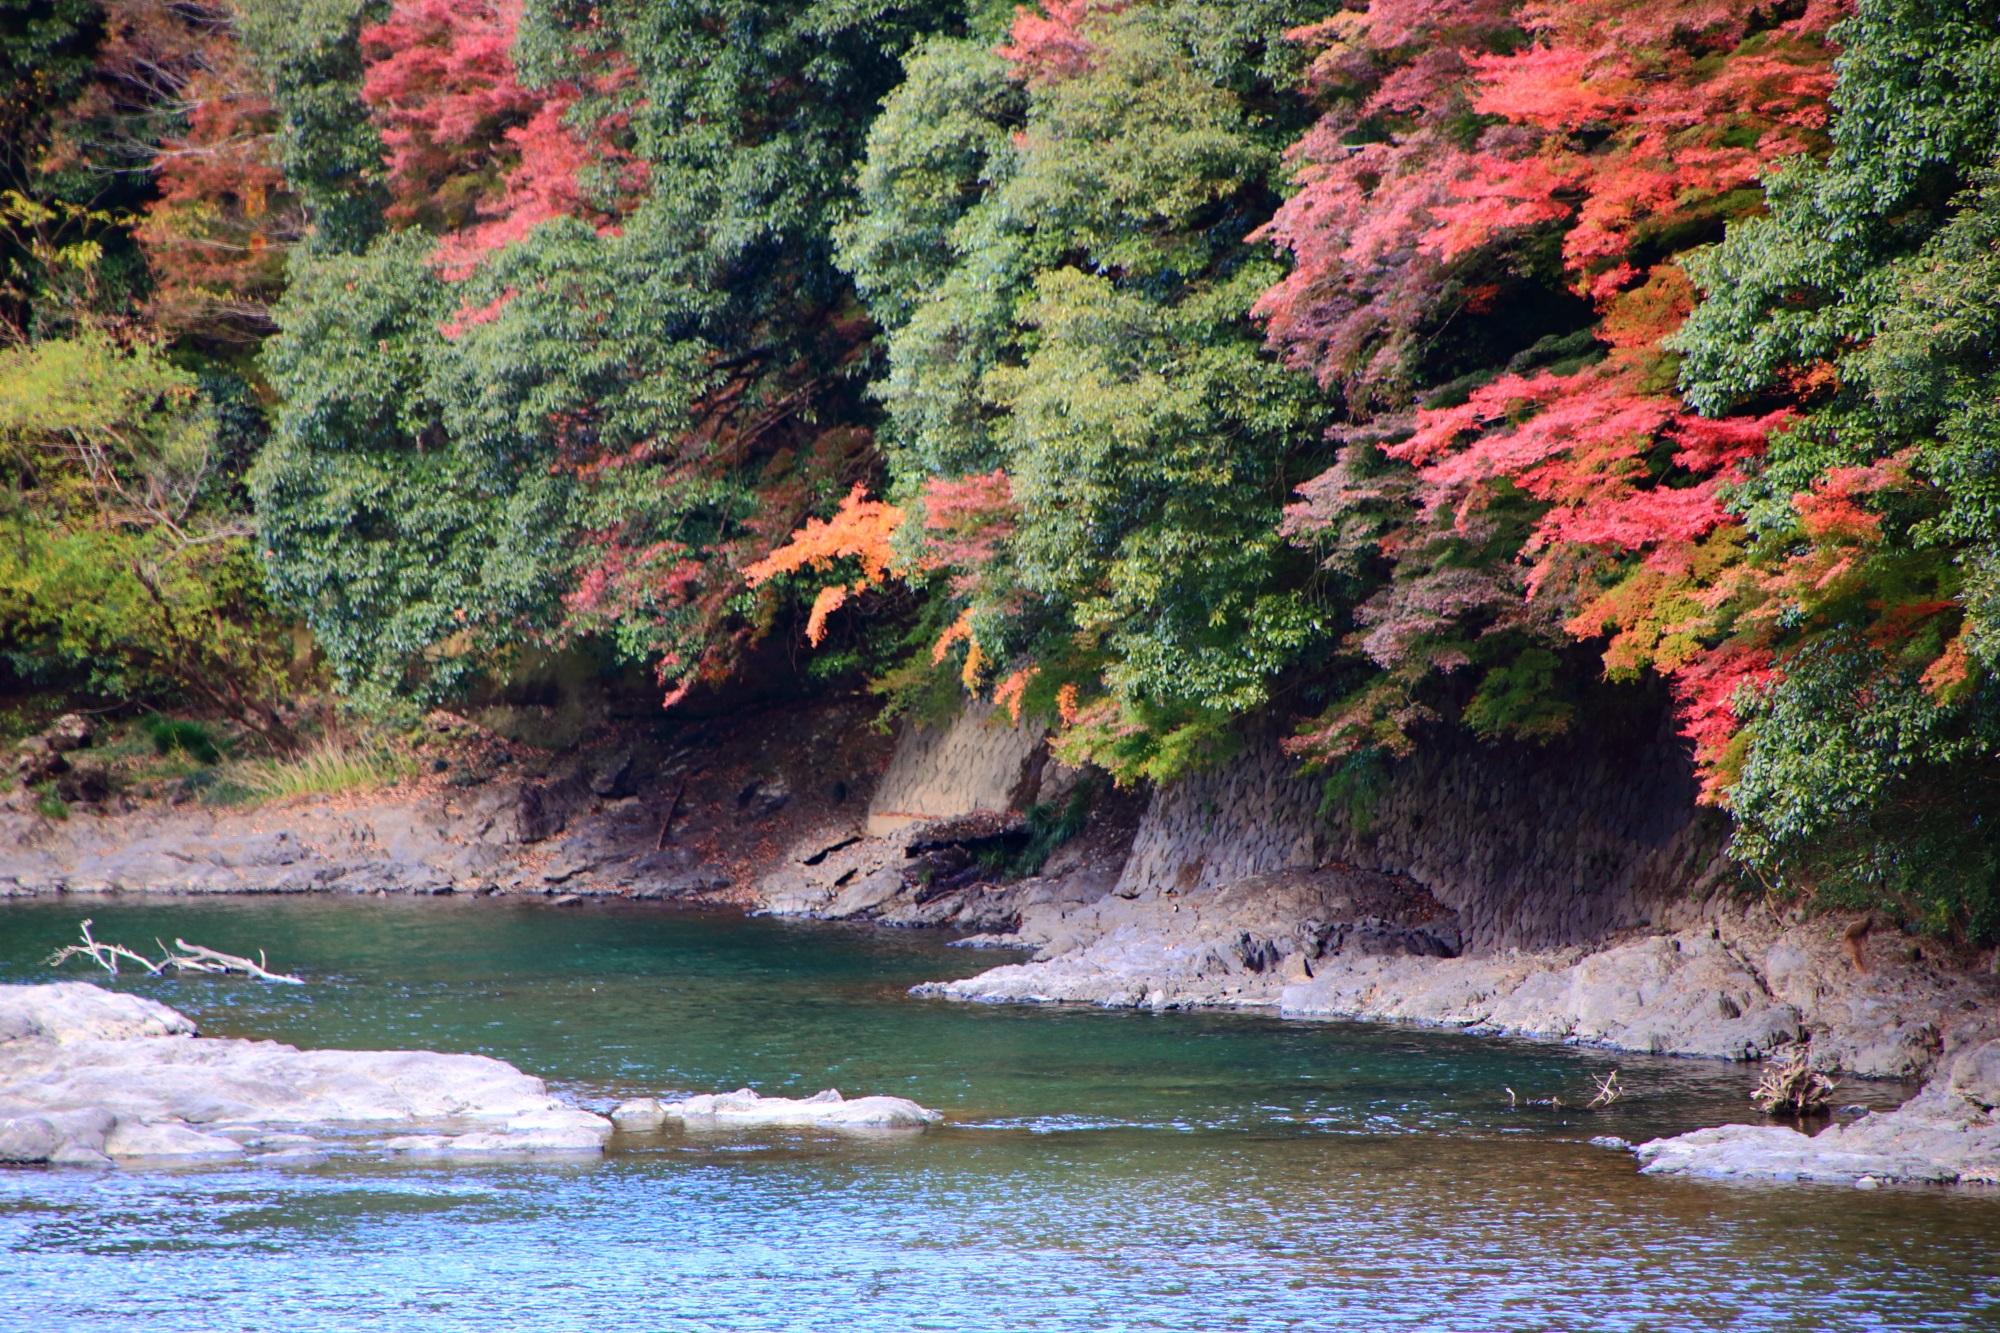 Uji-River Kyoto autumn leaves 紅葉 見ごろ 宇治川 秋